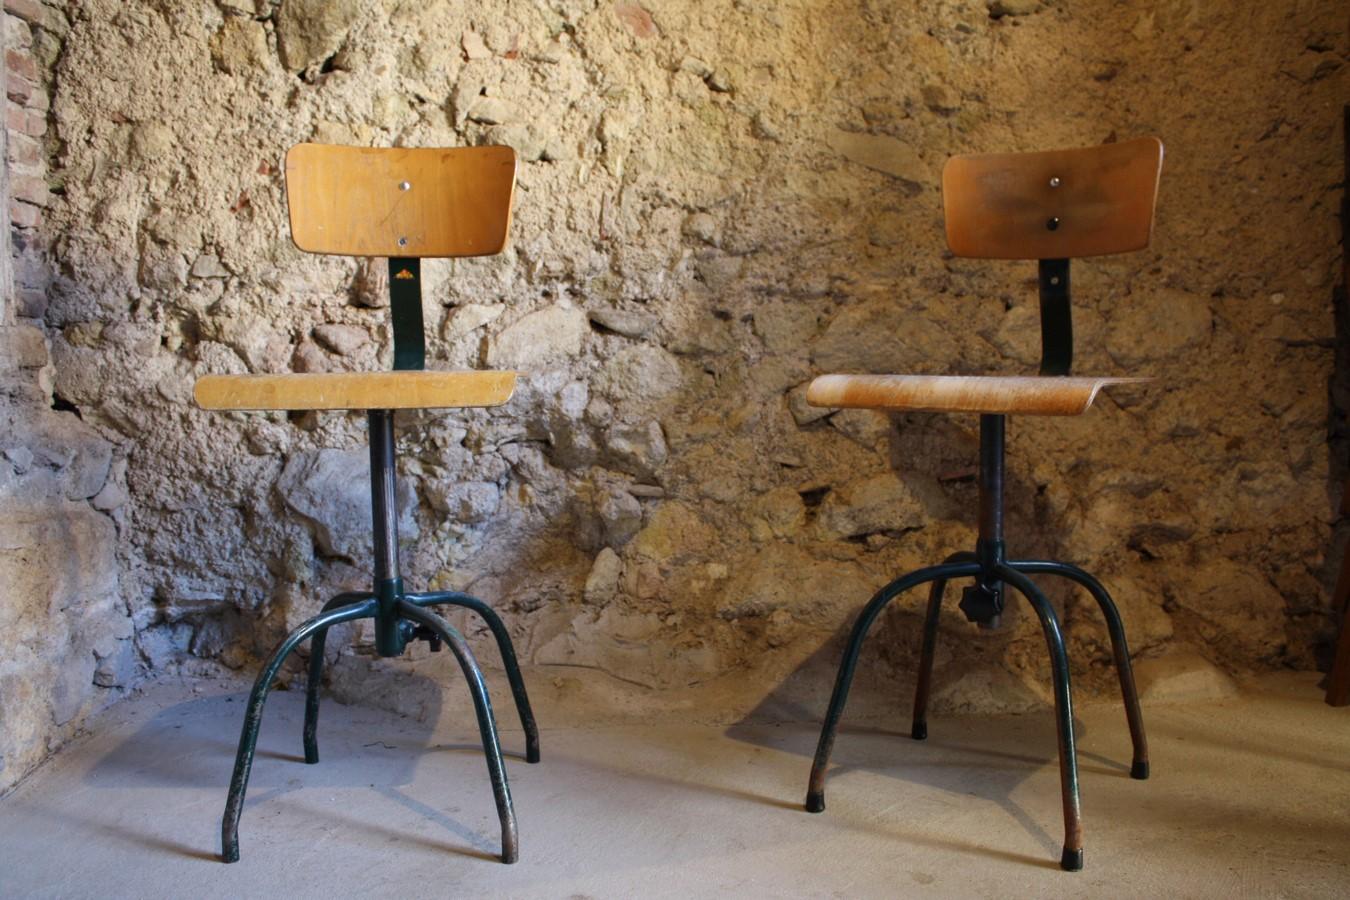 werkstattstuhle-industriestuhle-industrie-design-stuhle-gebraucht-alt-vintage-loft-3